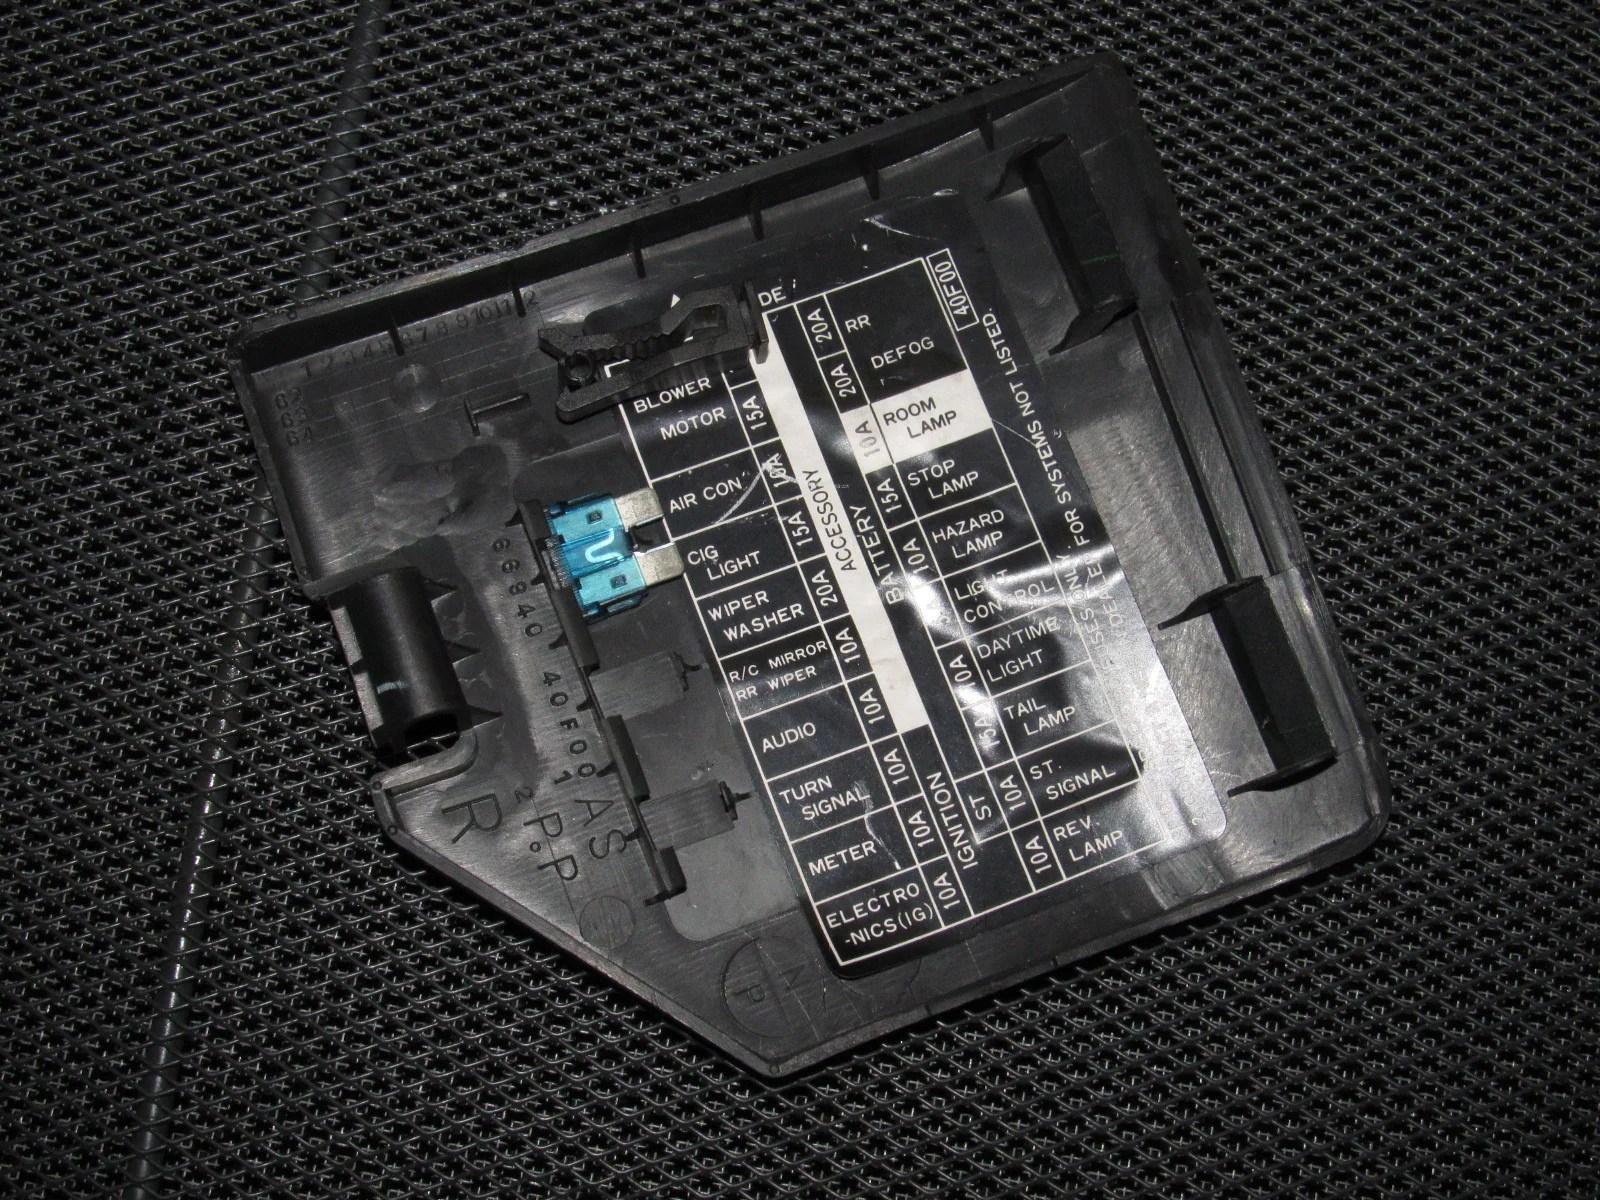 89 90 91 92 93 94 Nissan 240SX OEM Interior Fuse Box Cover